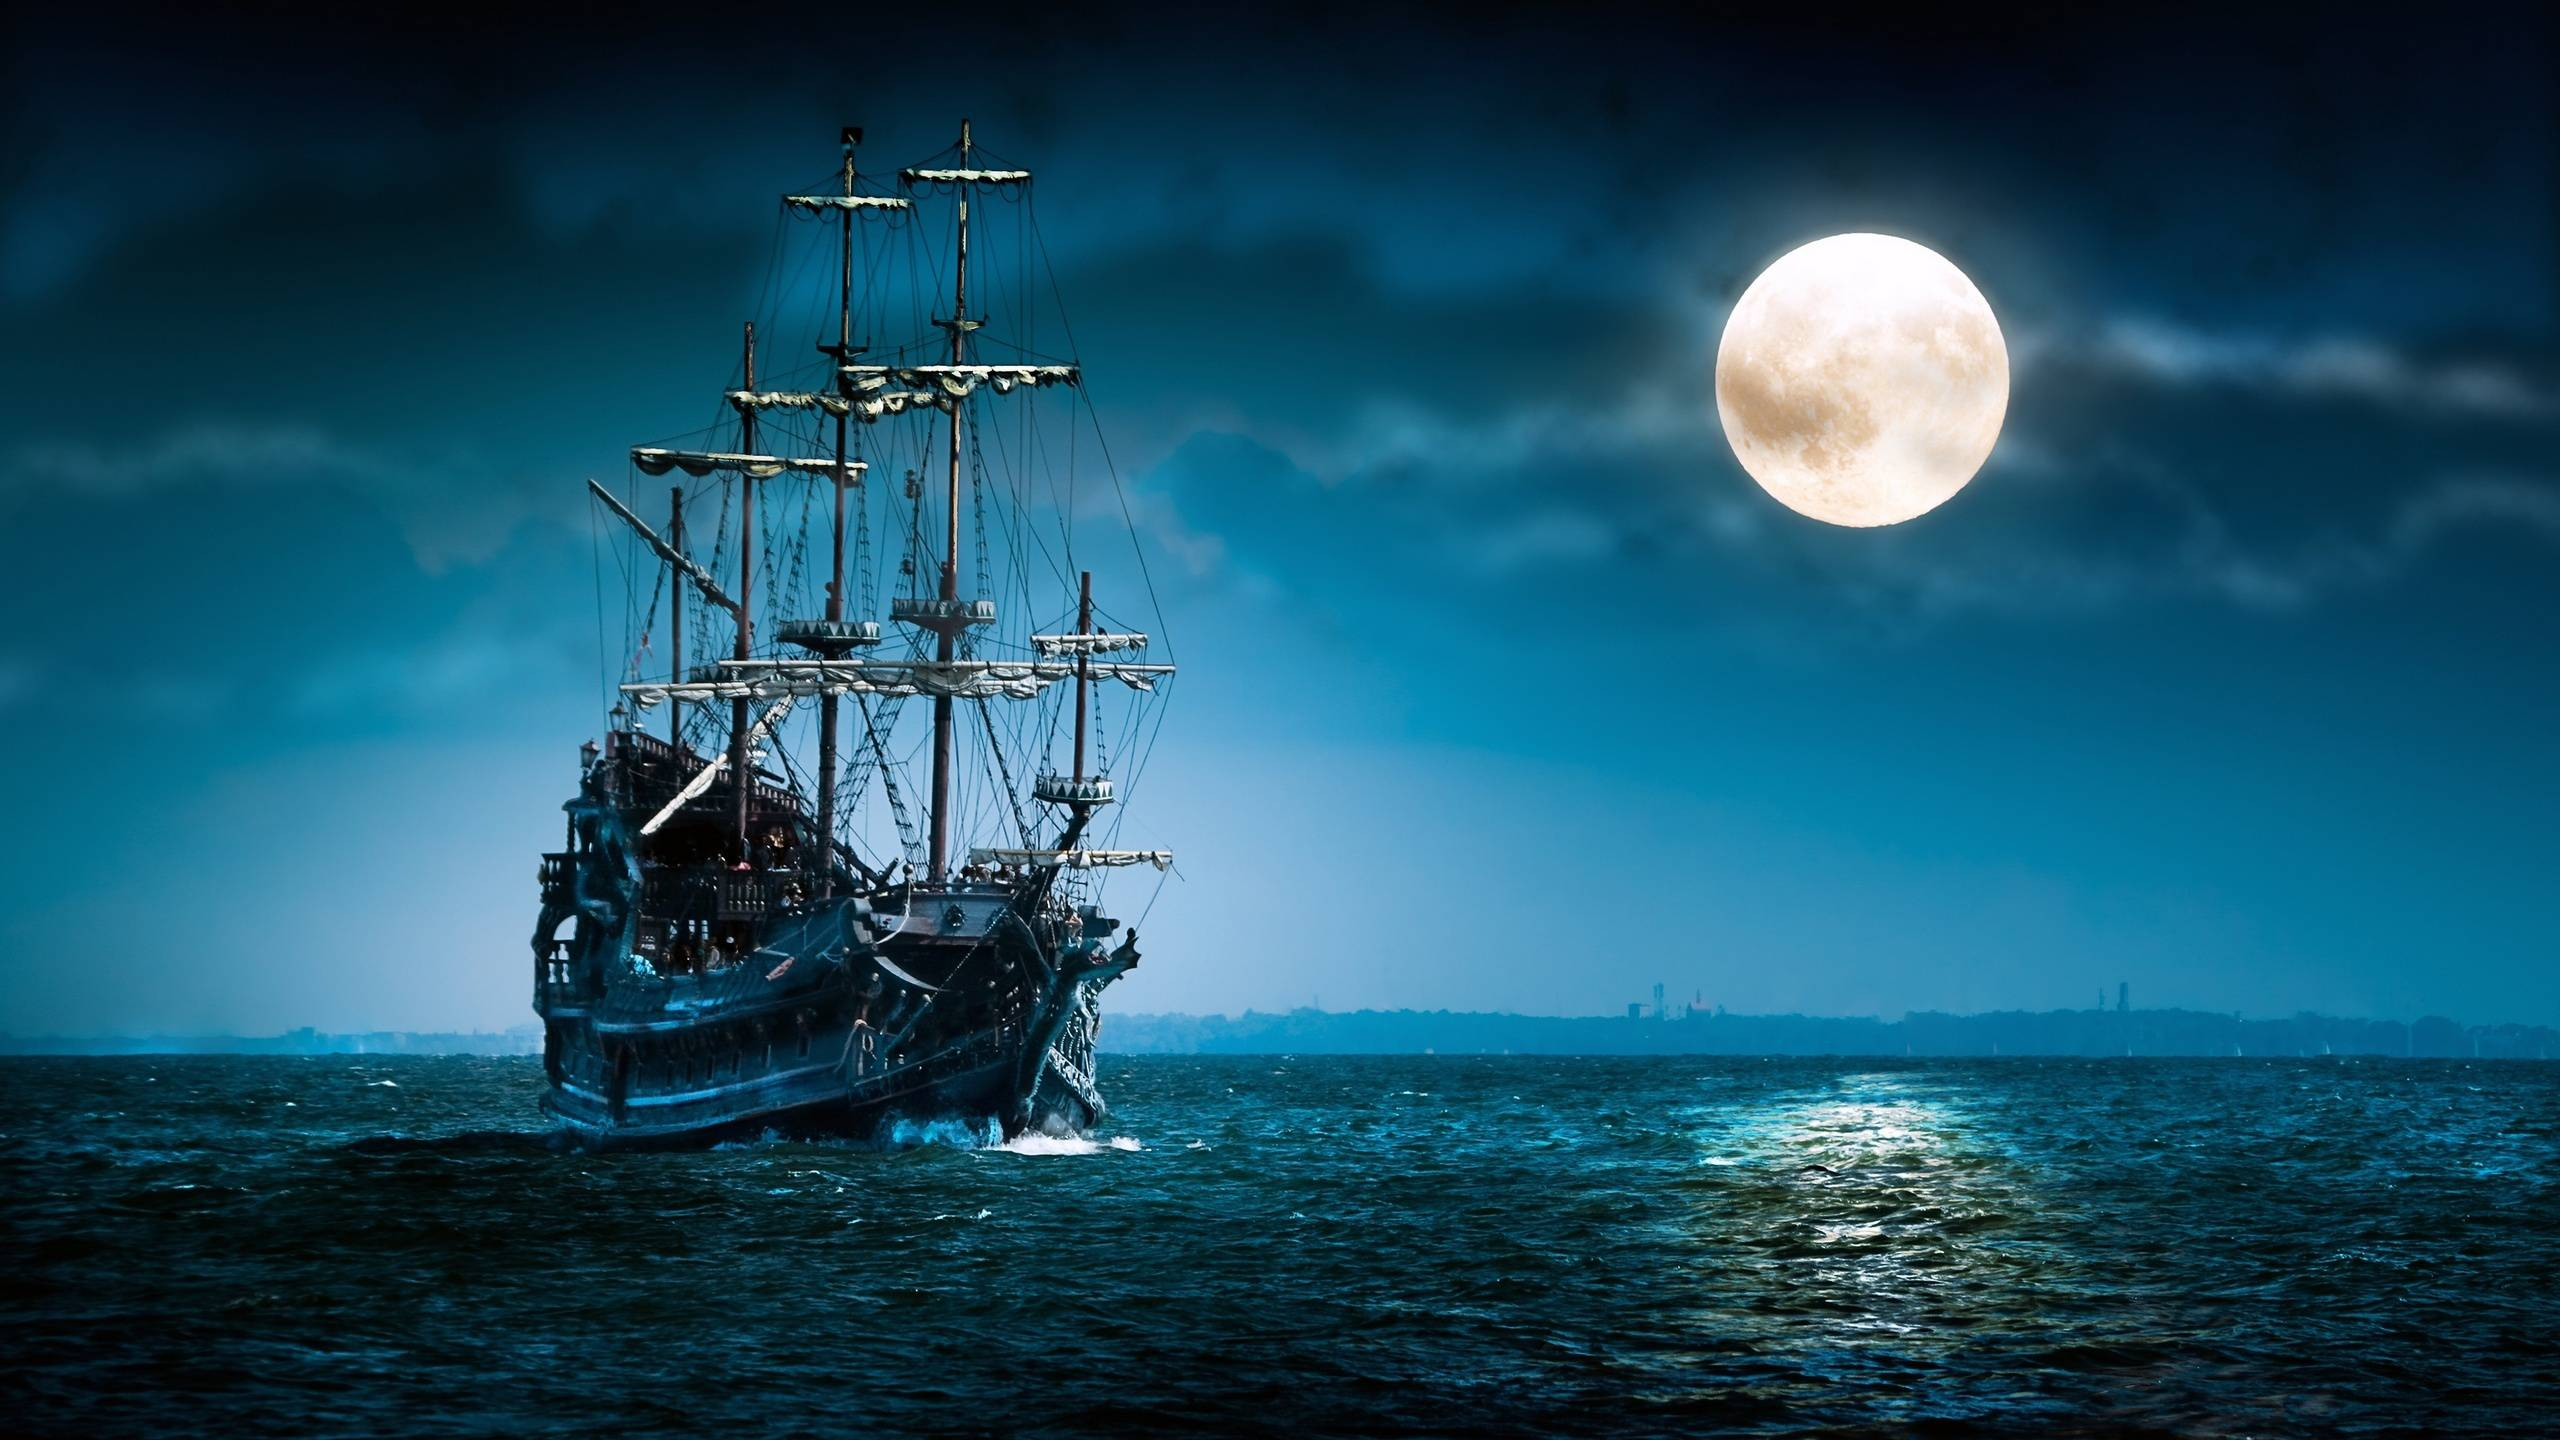 Navigating Under The Moonlight Night Wallpaper 2560x1440 Px Free